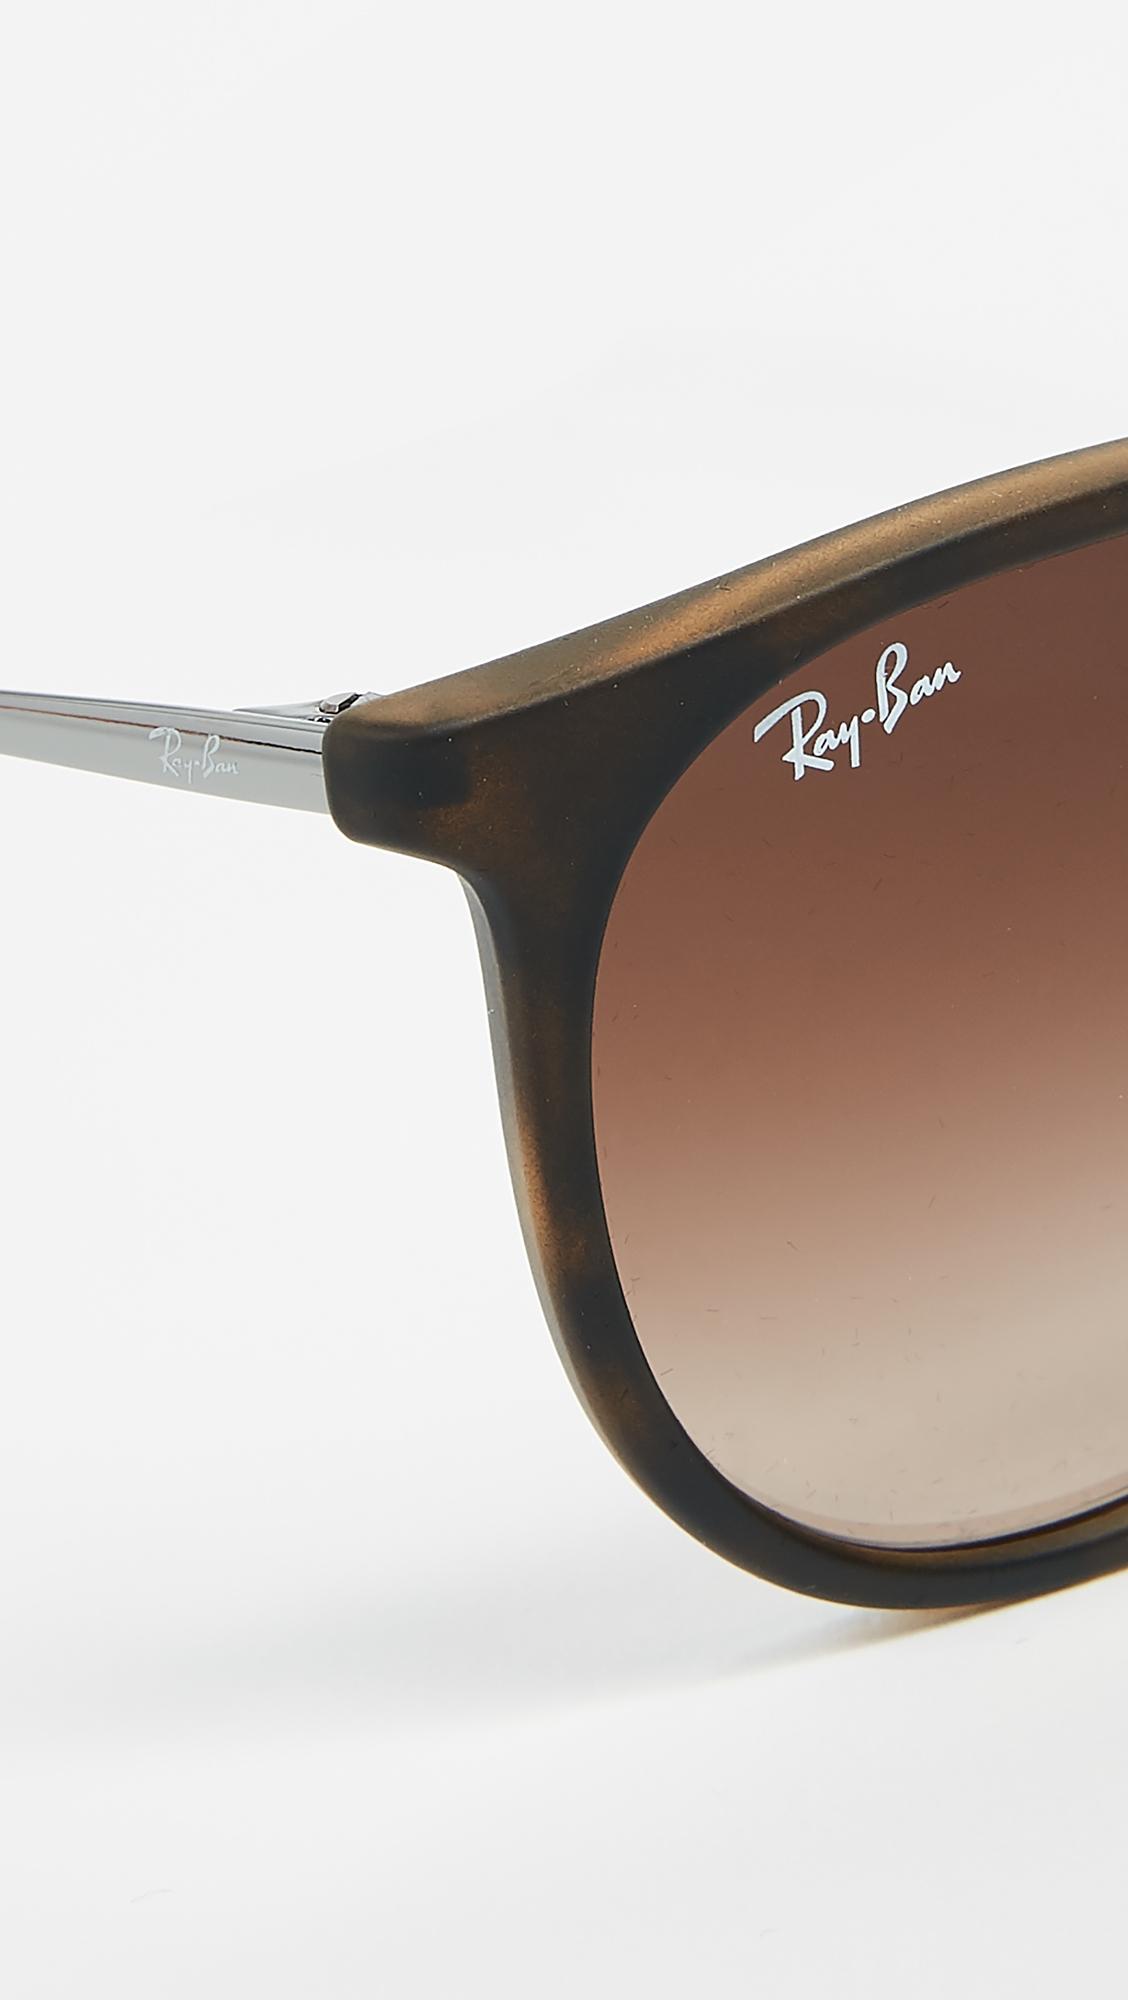 Солнцезащитные очки Erika Ray-Ban  (RAYBN4026042772314)